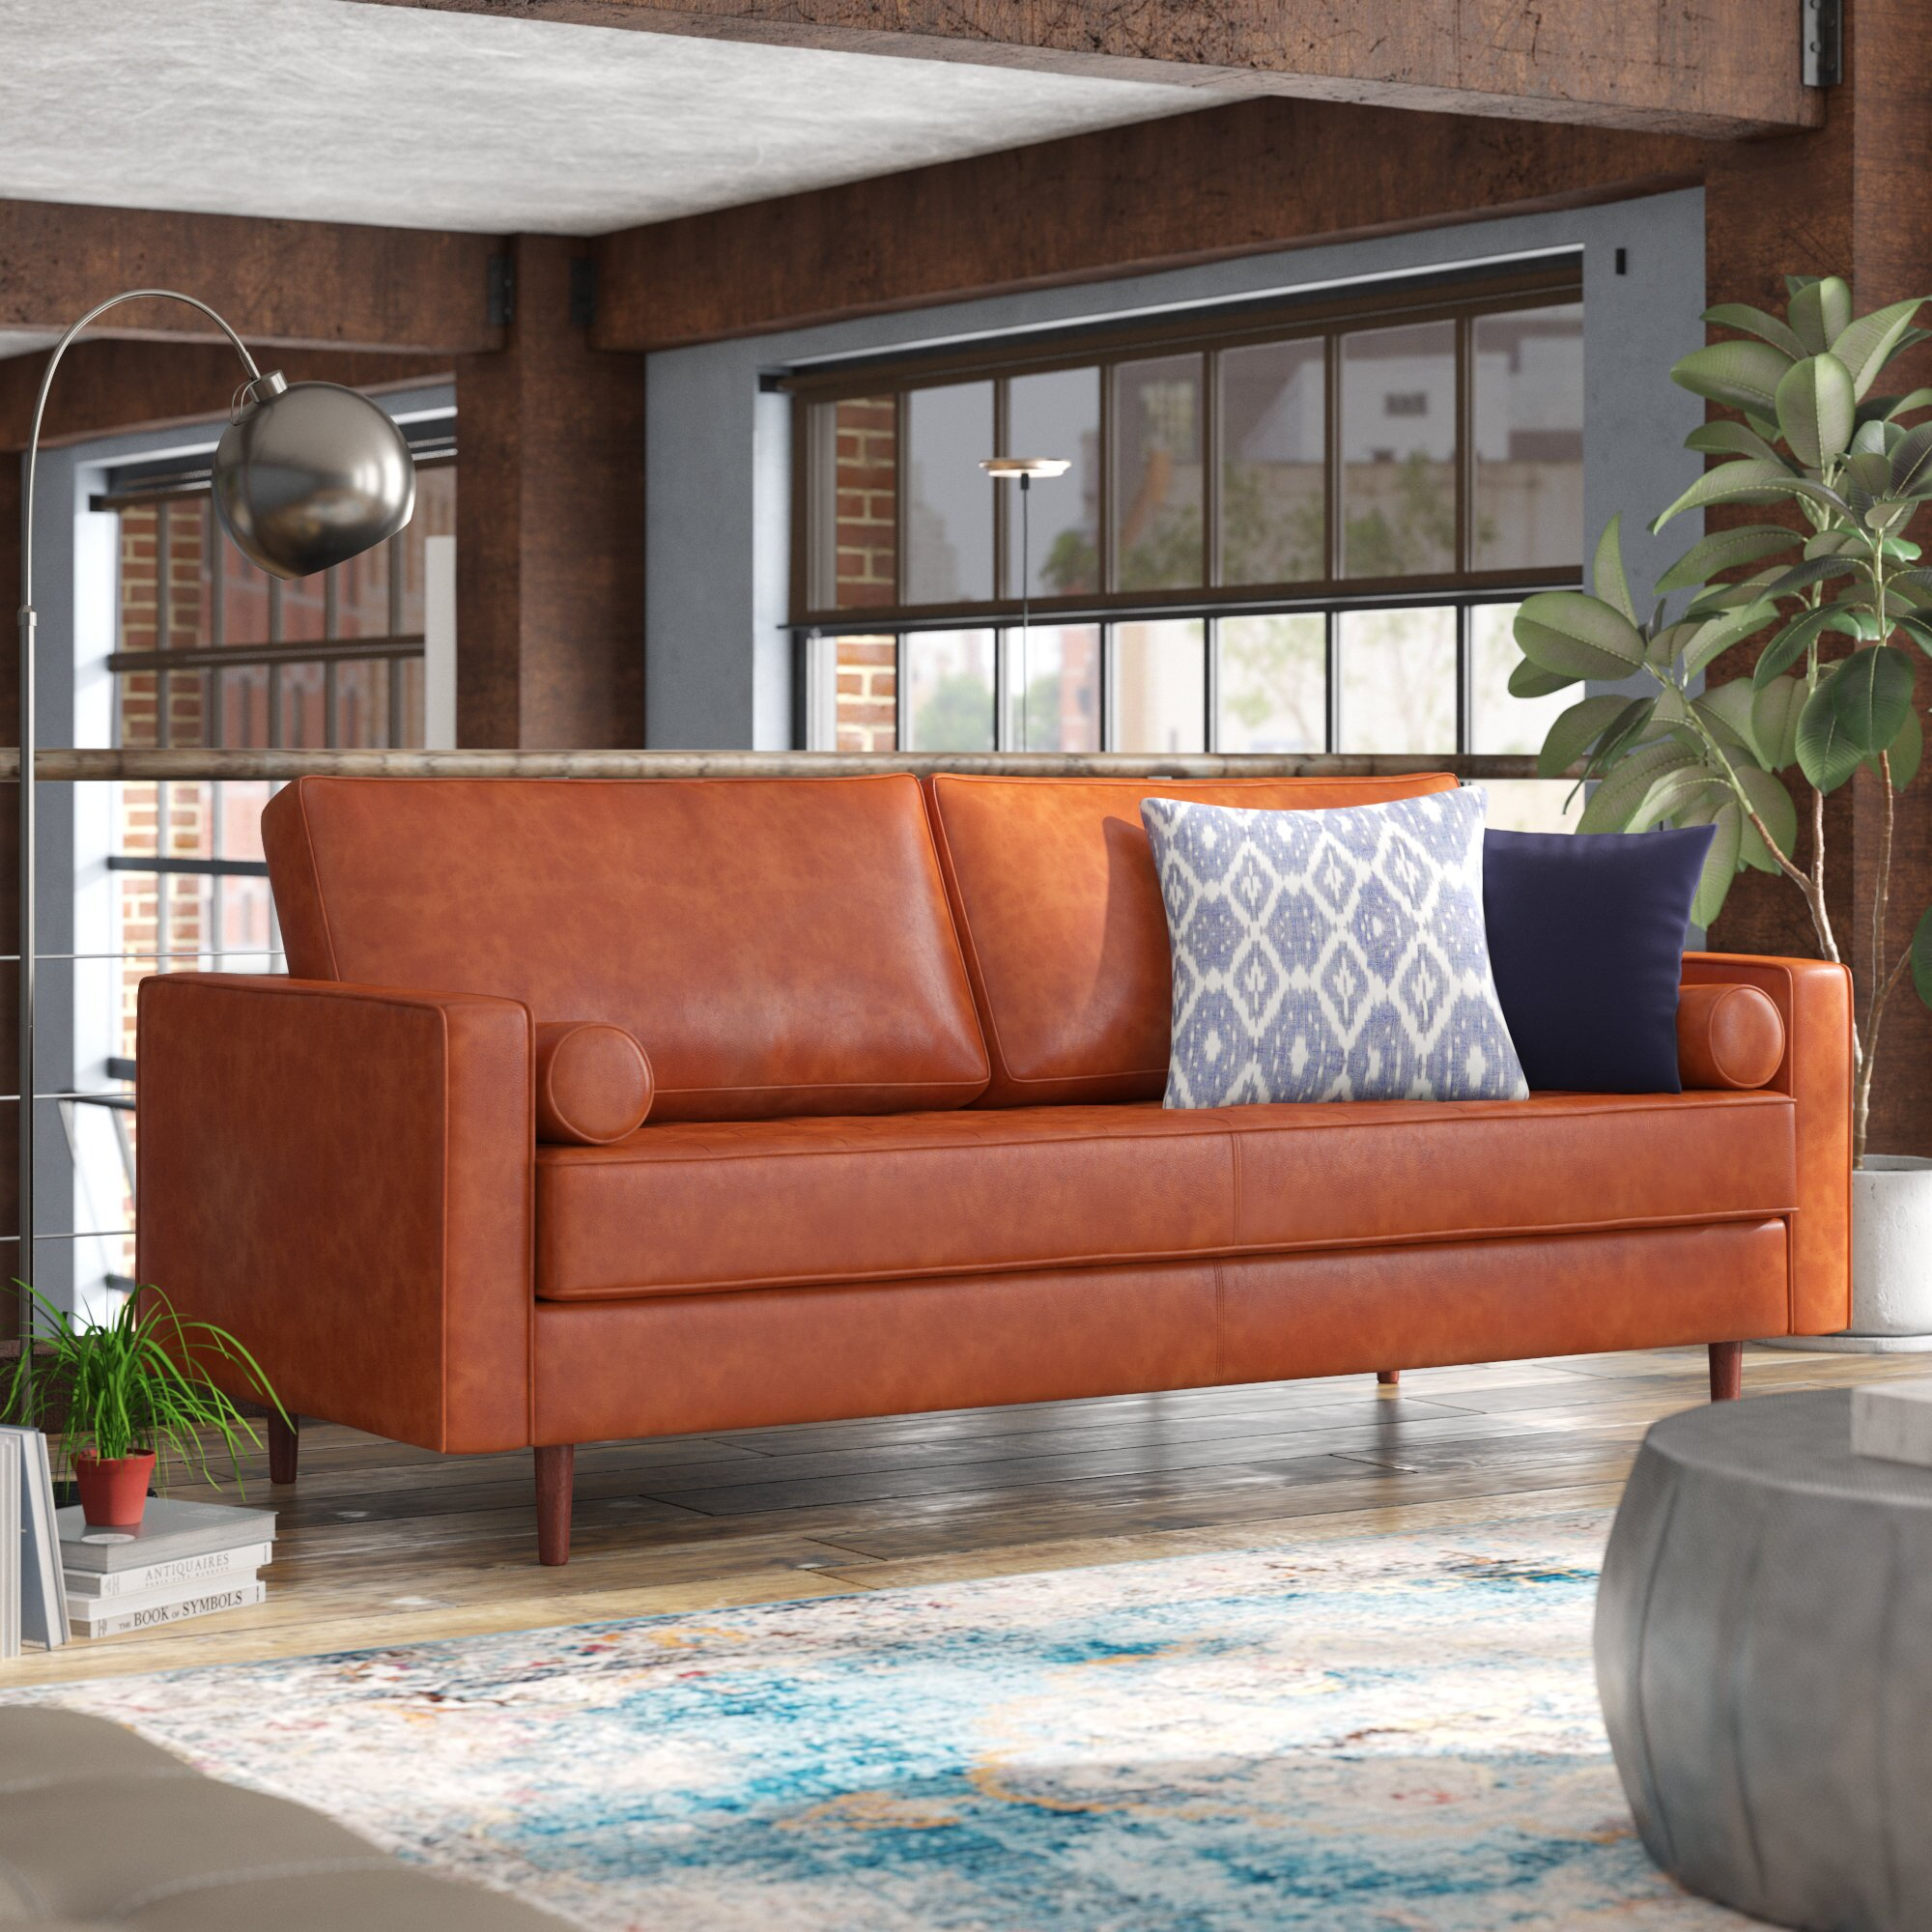 Wayfair | Trent Austin Design Bombay Leather Sofa